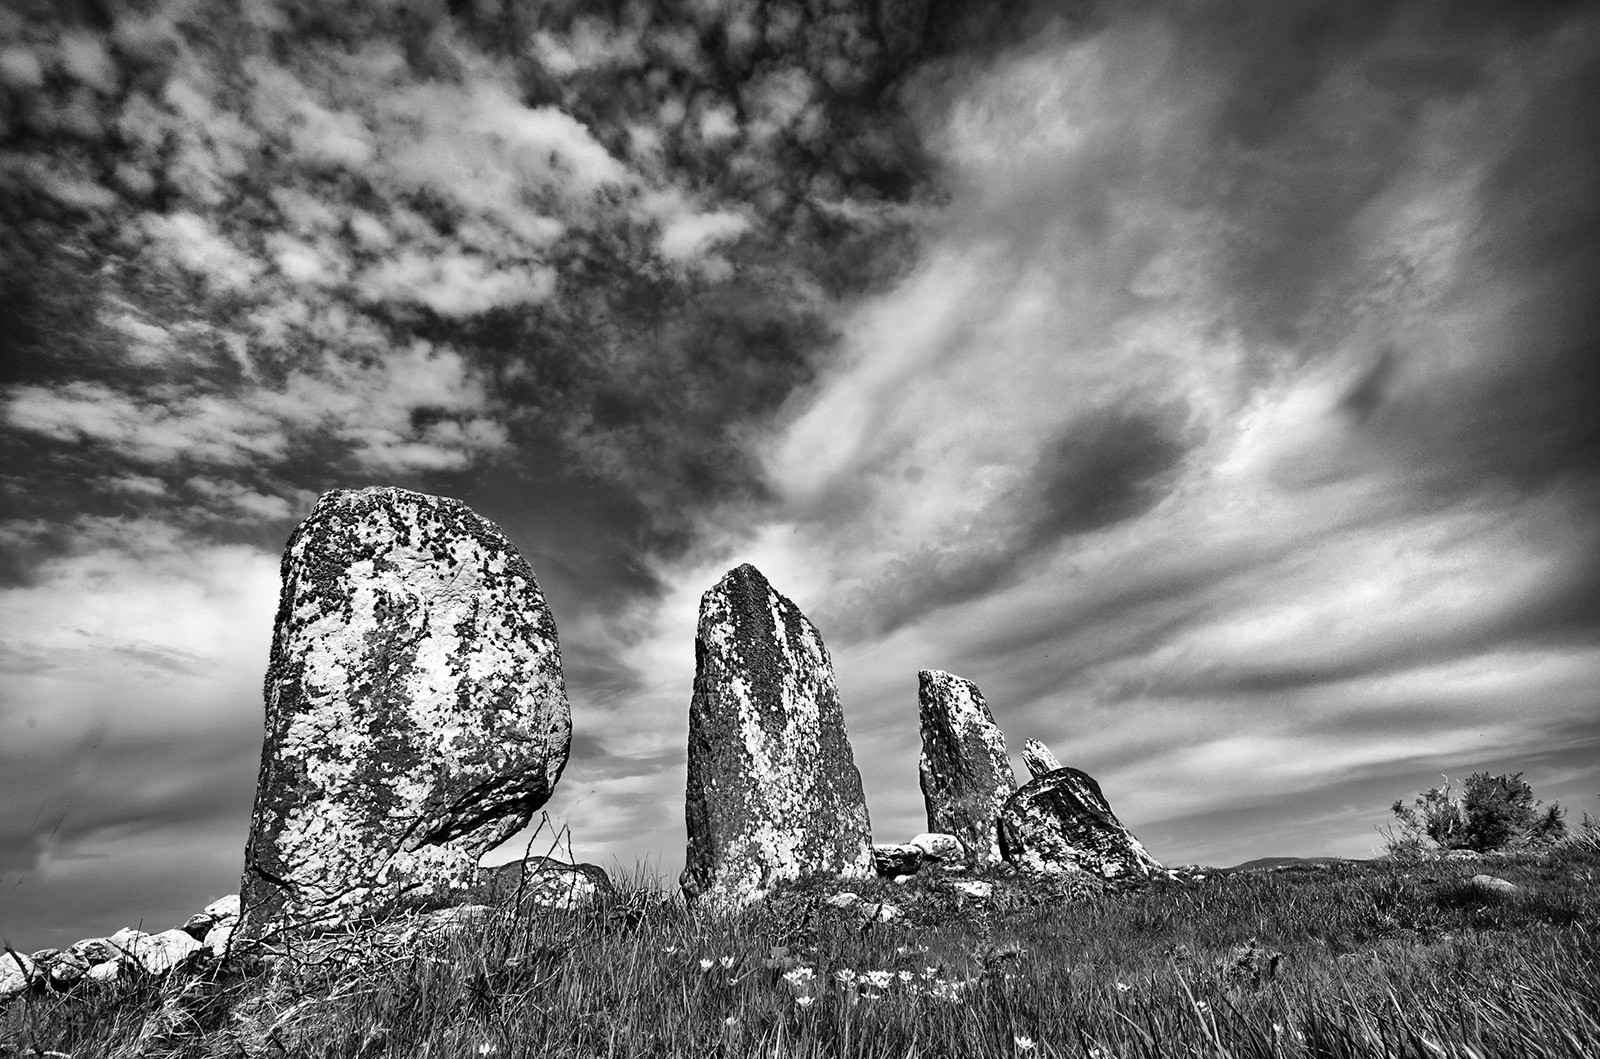 MONO - Standing Stones by Kieran D Murray (10 marks)